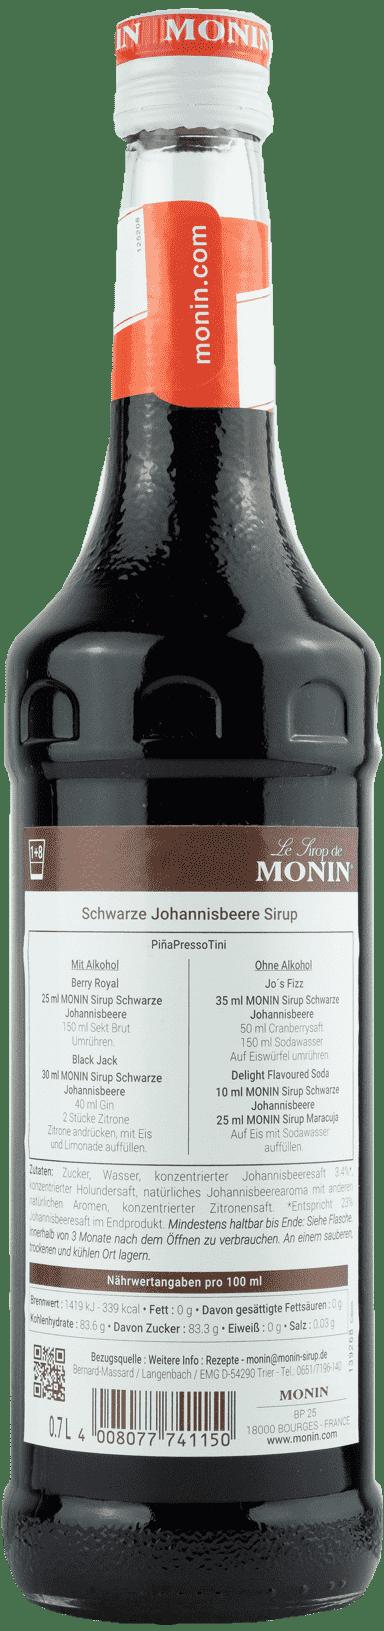 Monin Sirup Schwarze Johannisbeere 0,7l Cassis Sirup